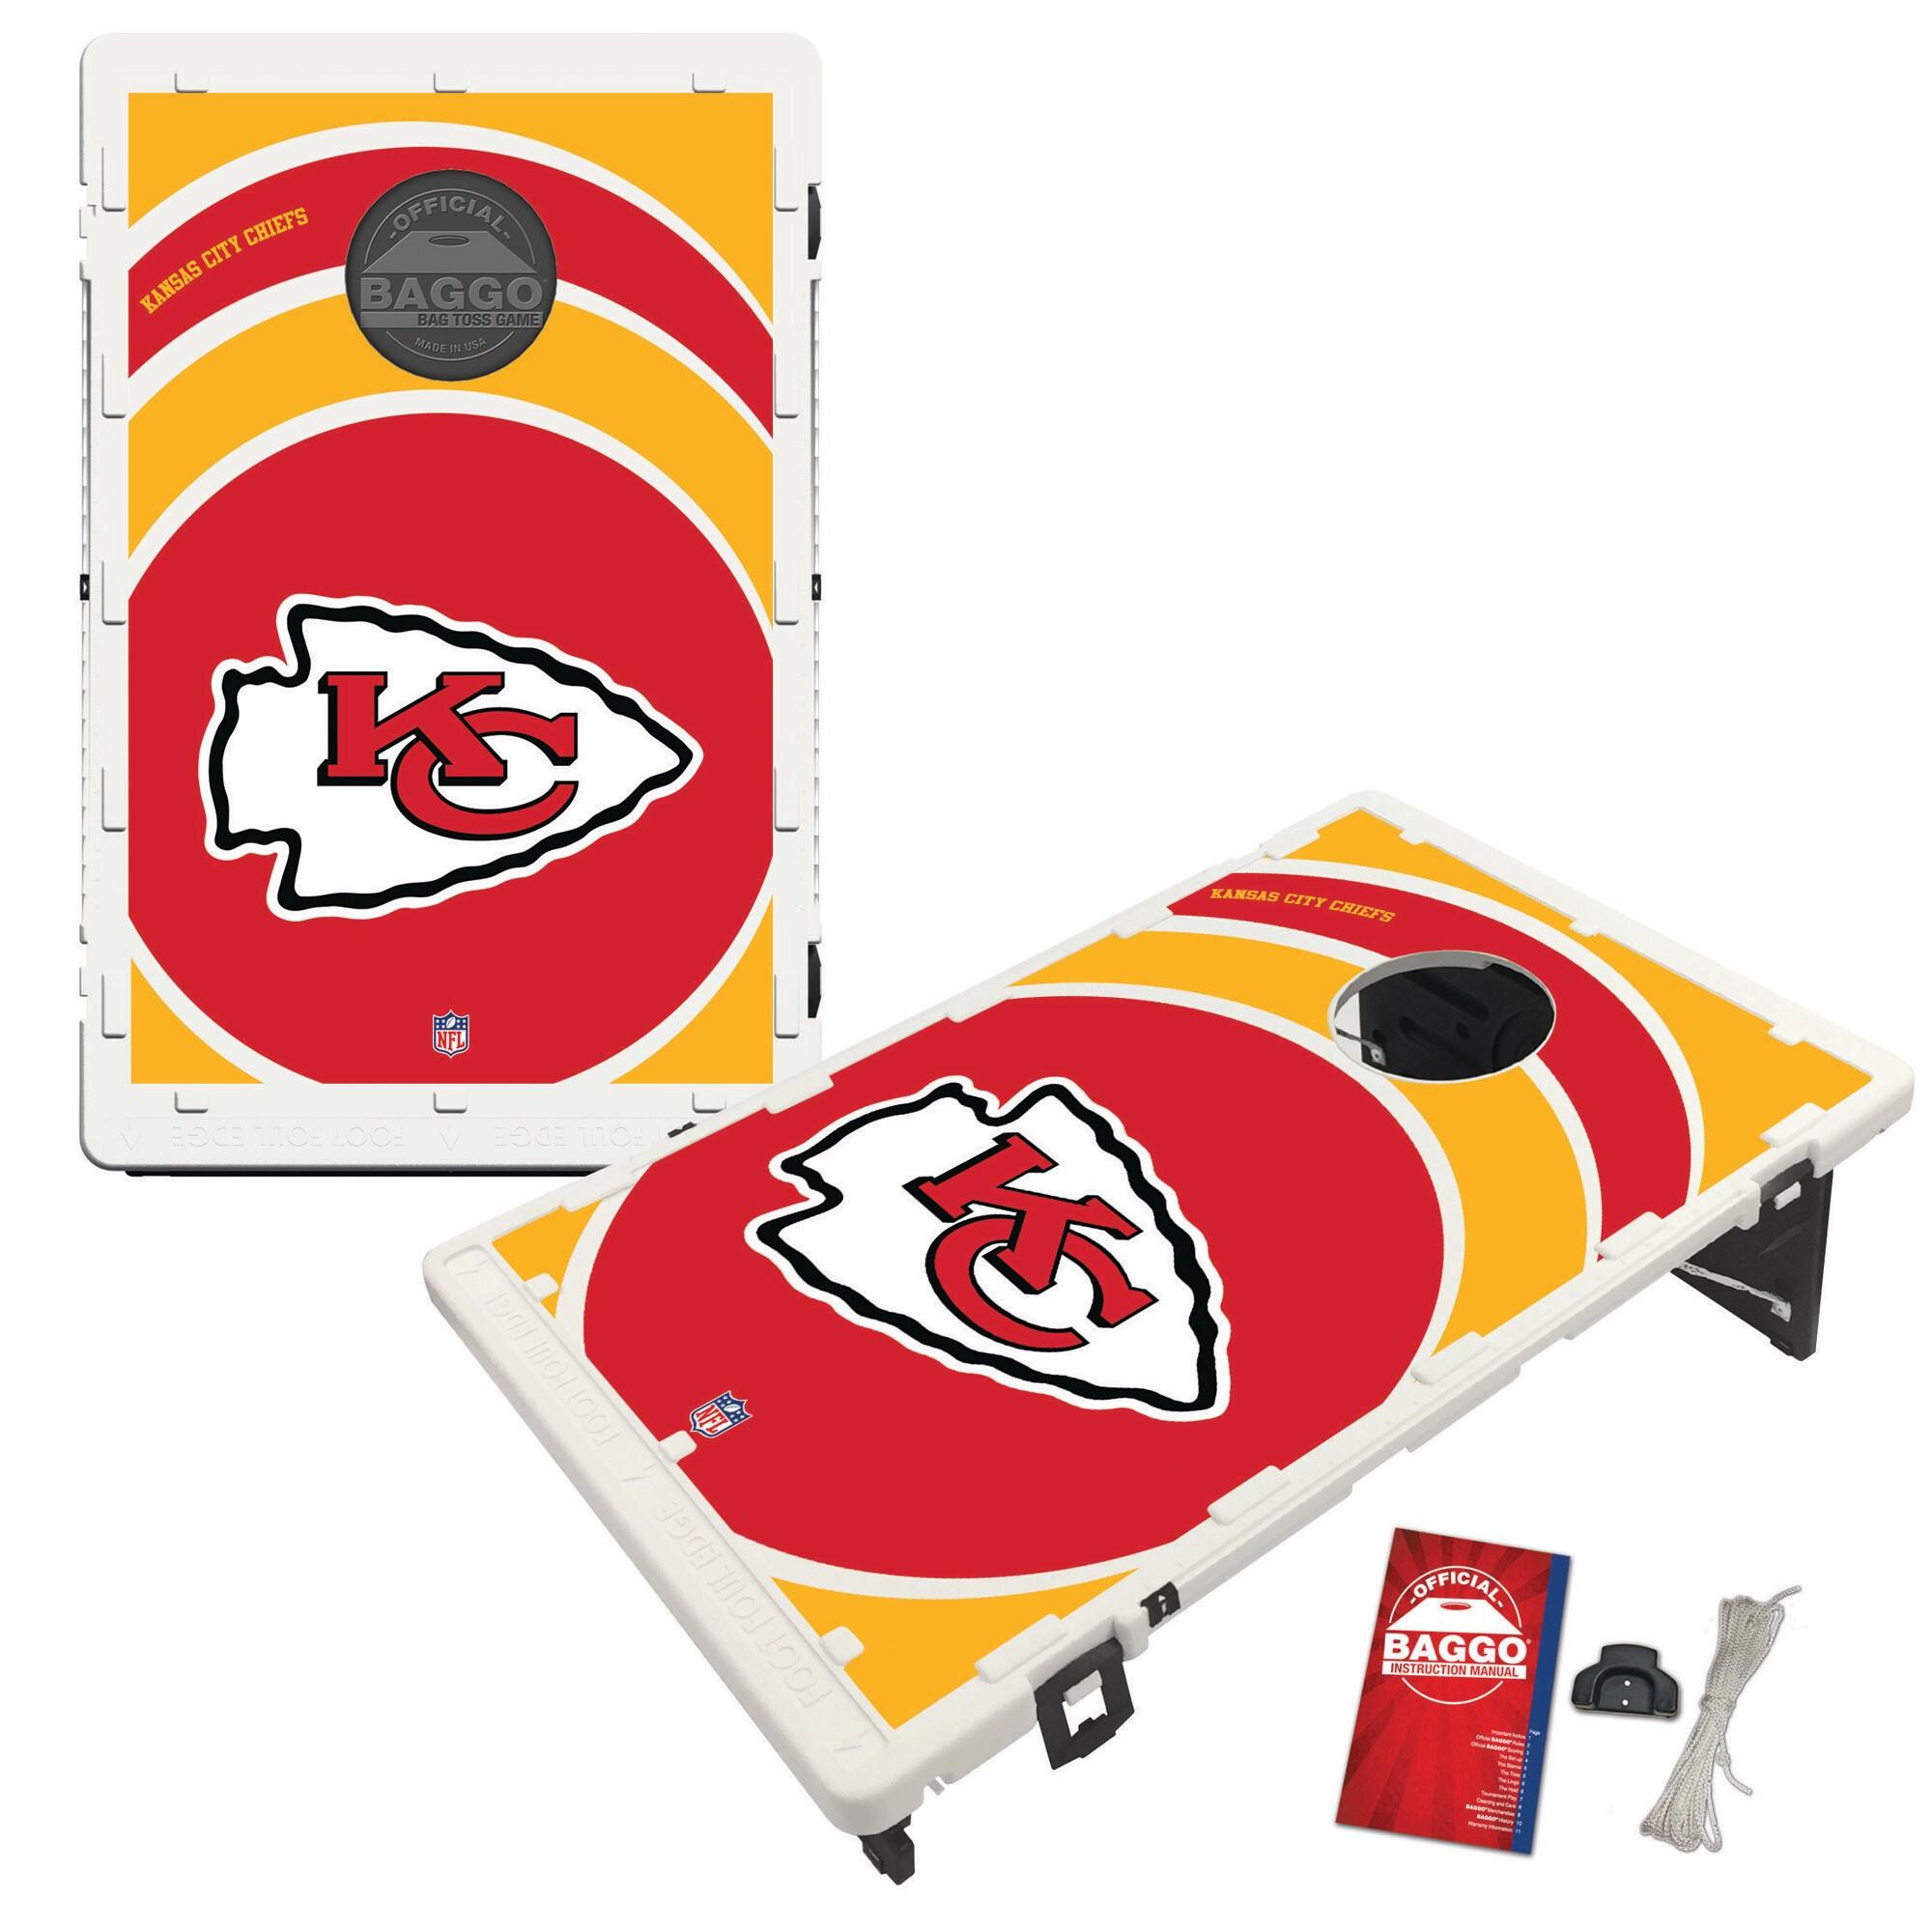 Kansas City Chiefs 2' x 3' BAGGO Vortex Cornhole Board Tailgate Toss Set